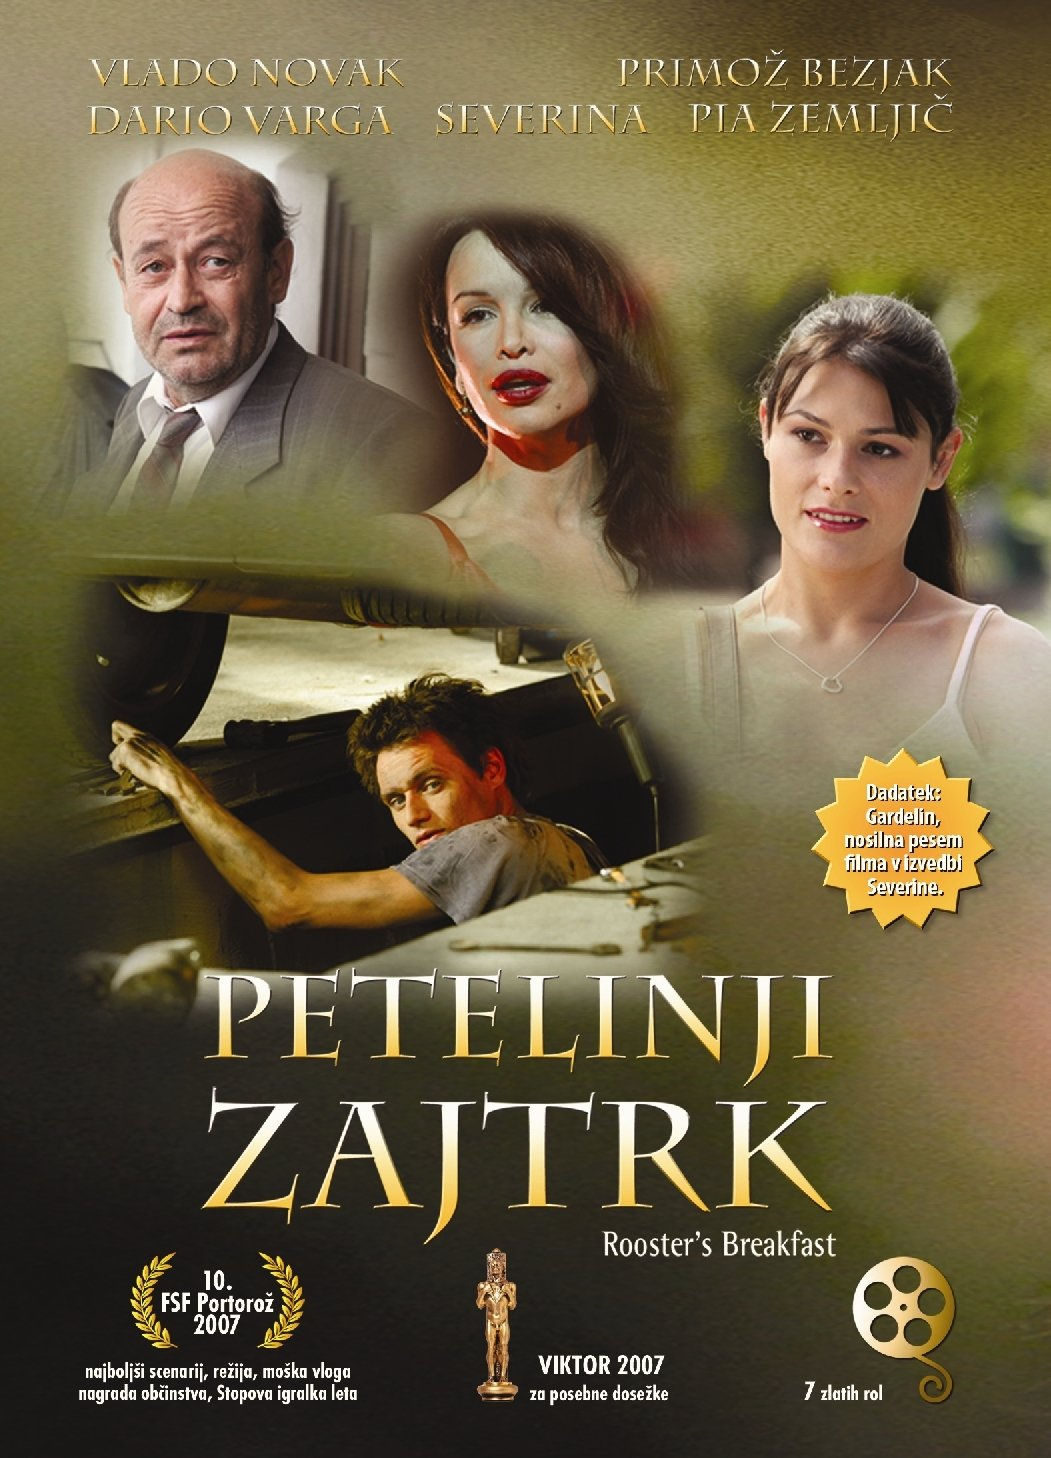 List Of Unfaithful Wife Movies